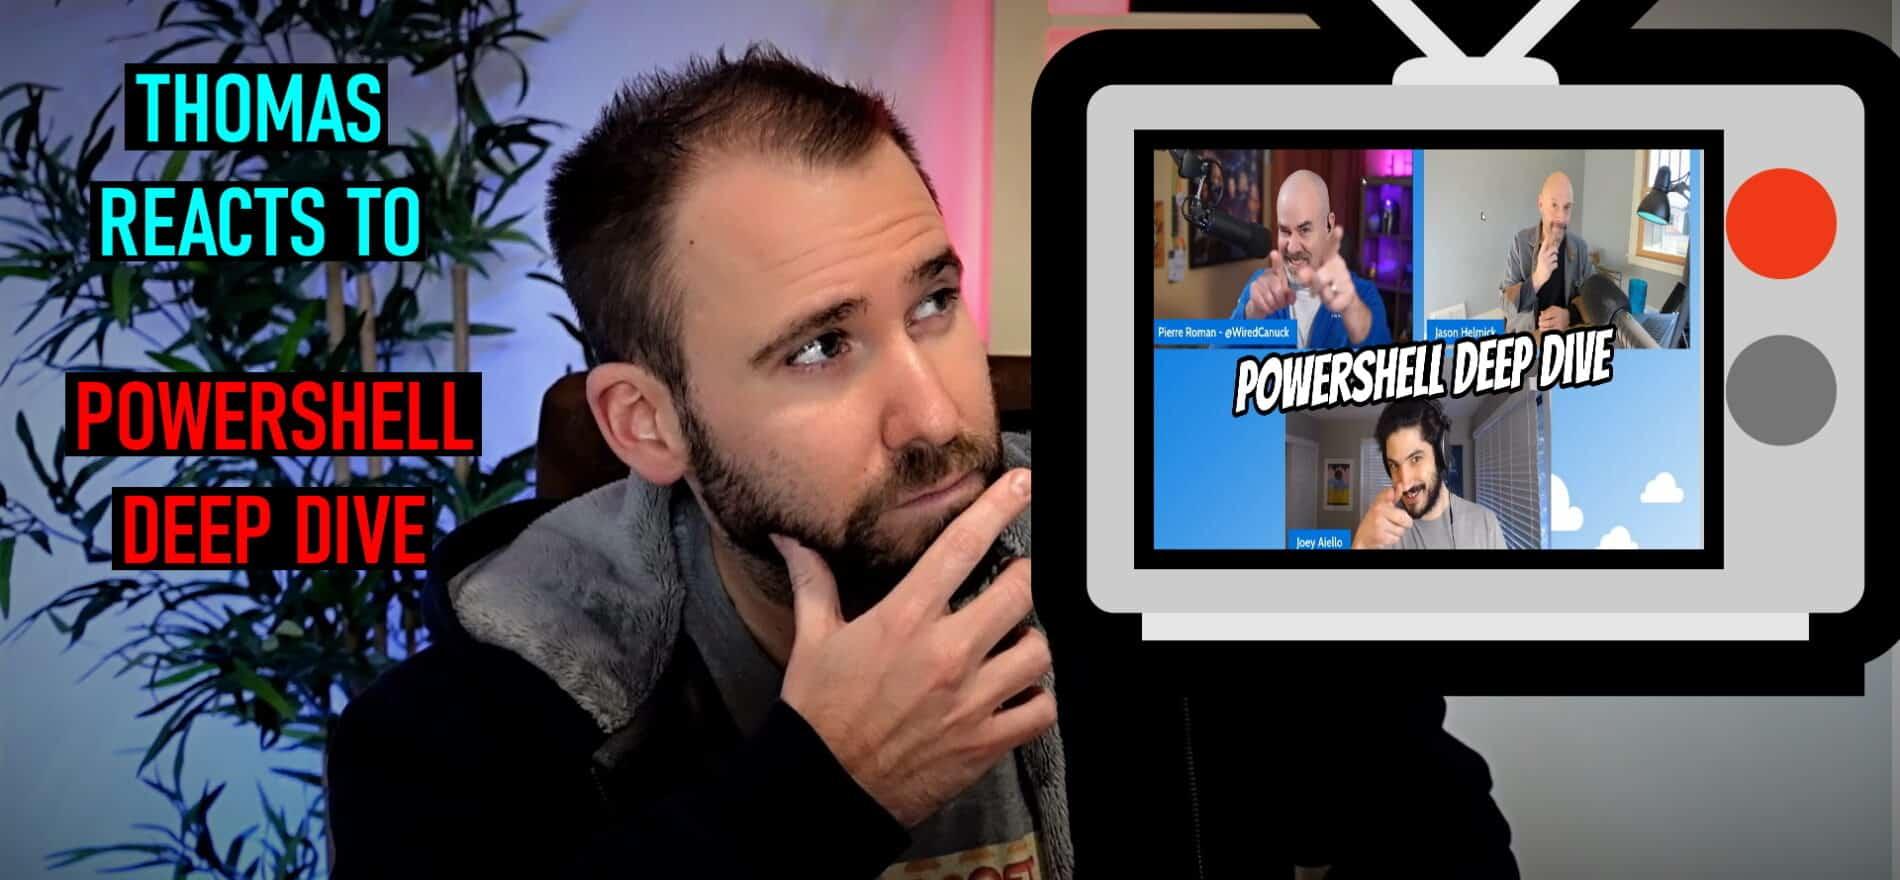 Thomas reacts on PowerShell Deep Dive